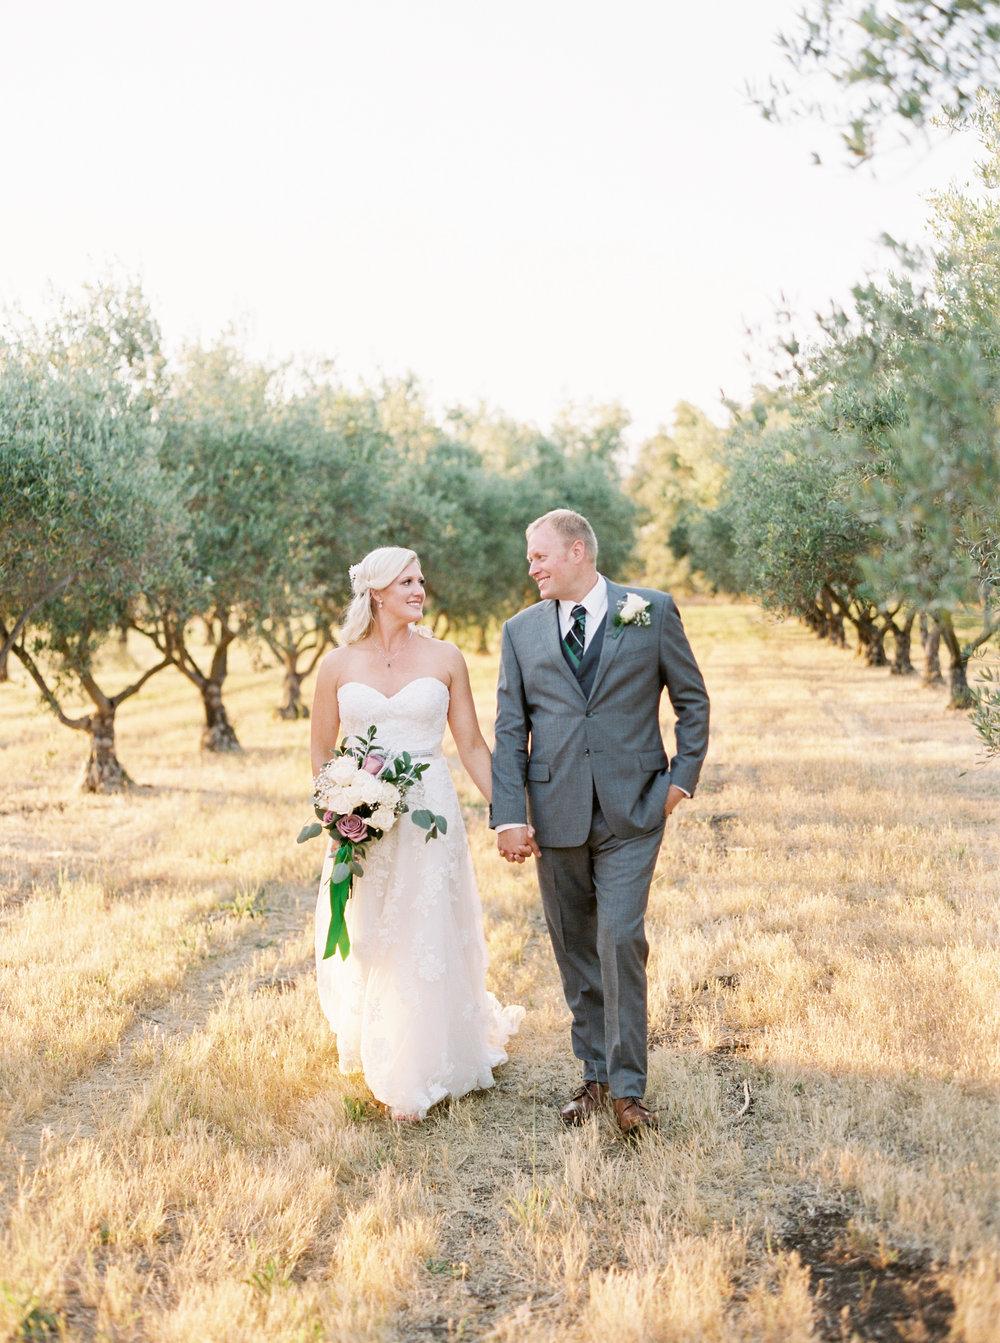 wolfe-heights-event-center-wedding-sacramento-california-wedding-27.jpg